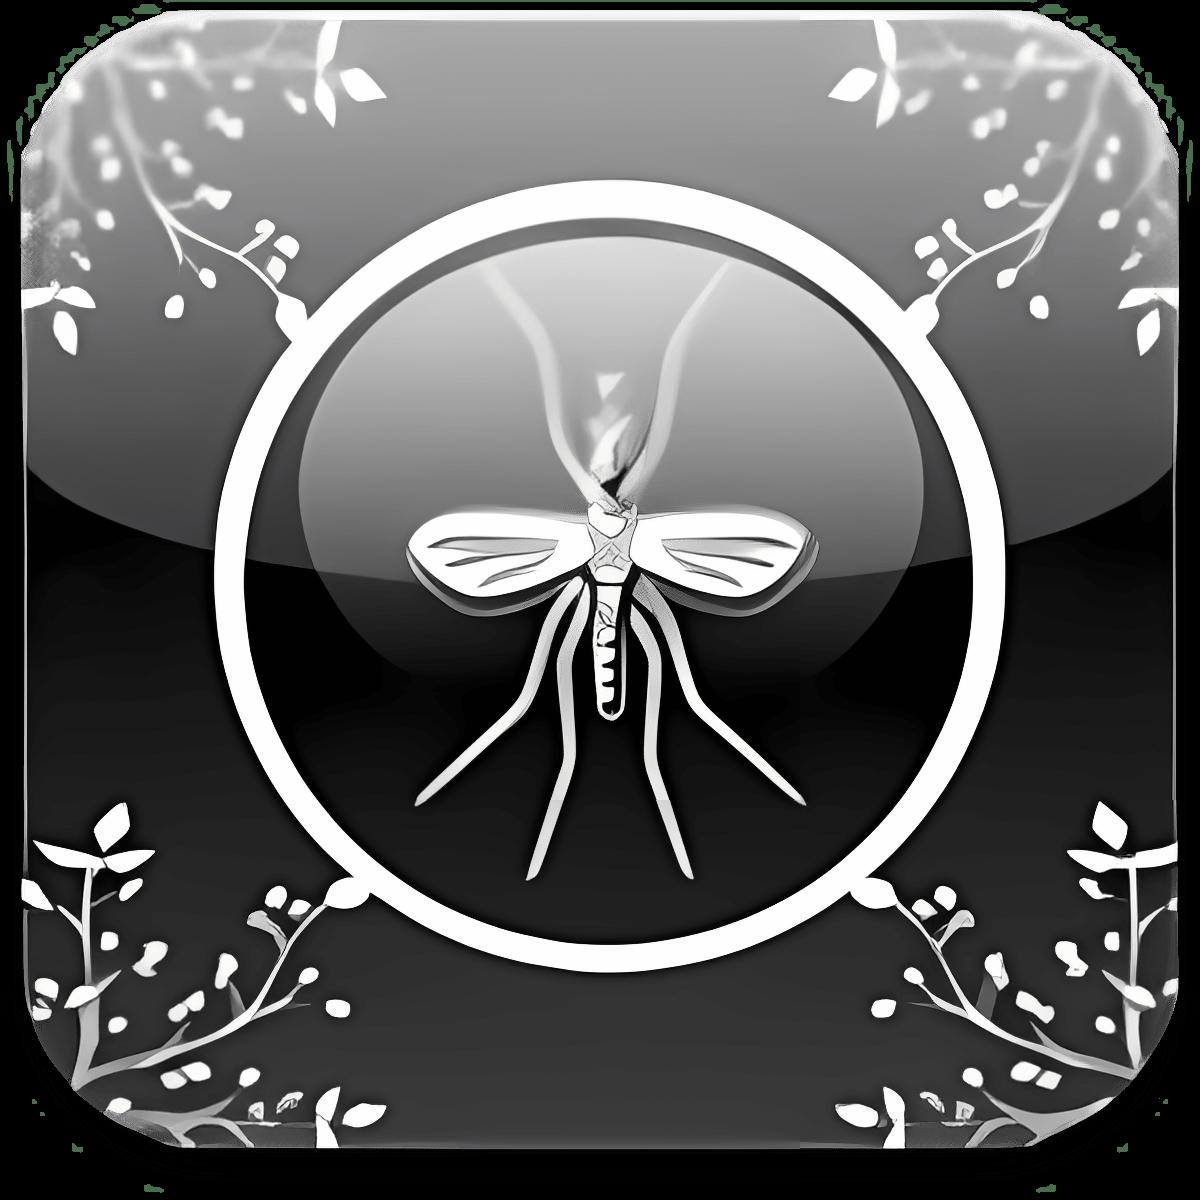 Anti mosquito repellent sounds